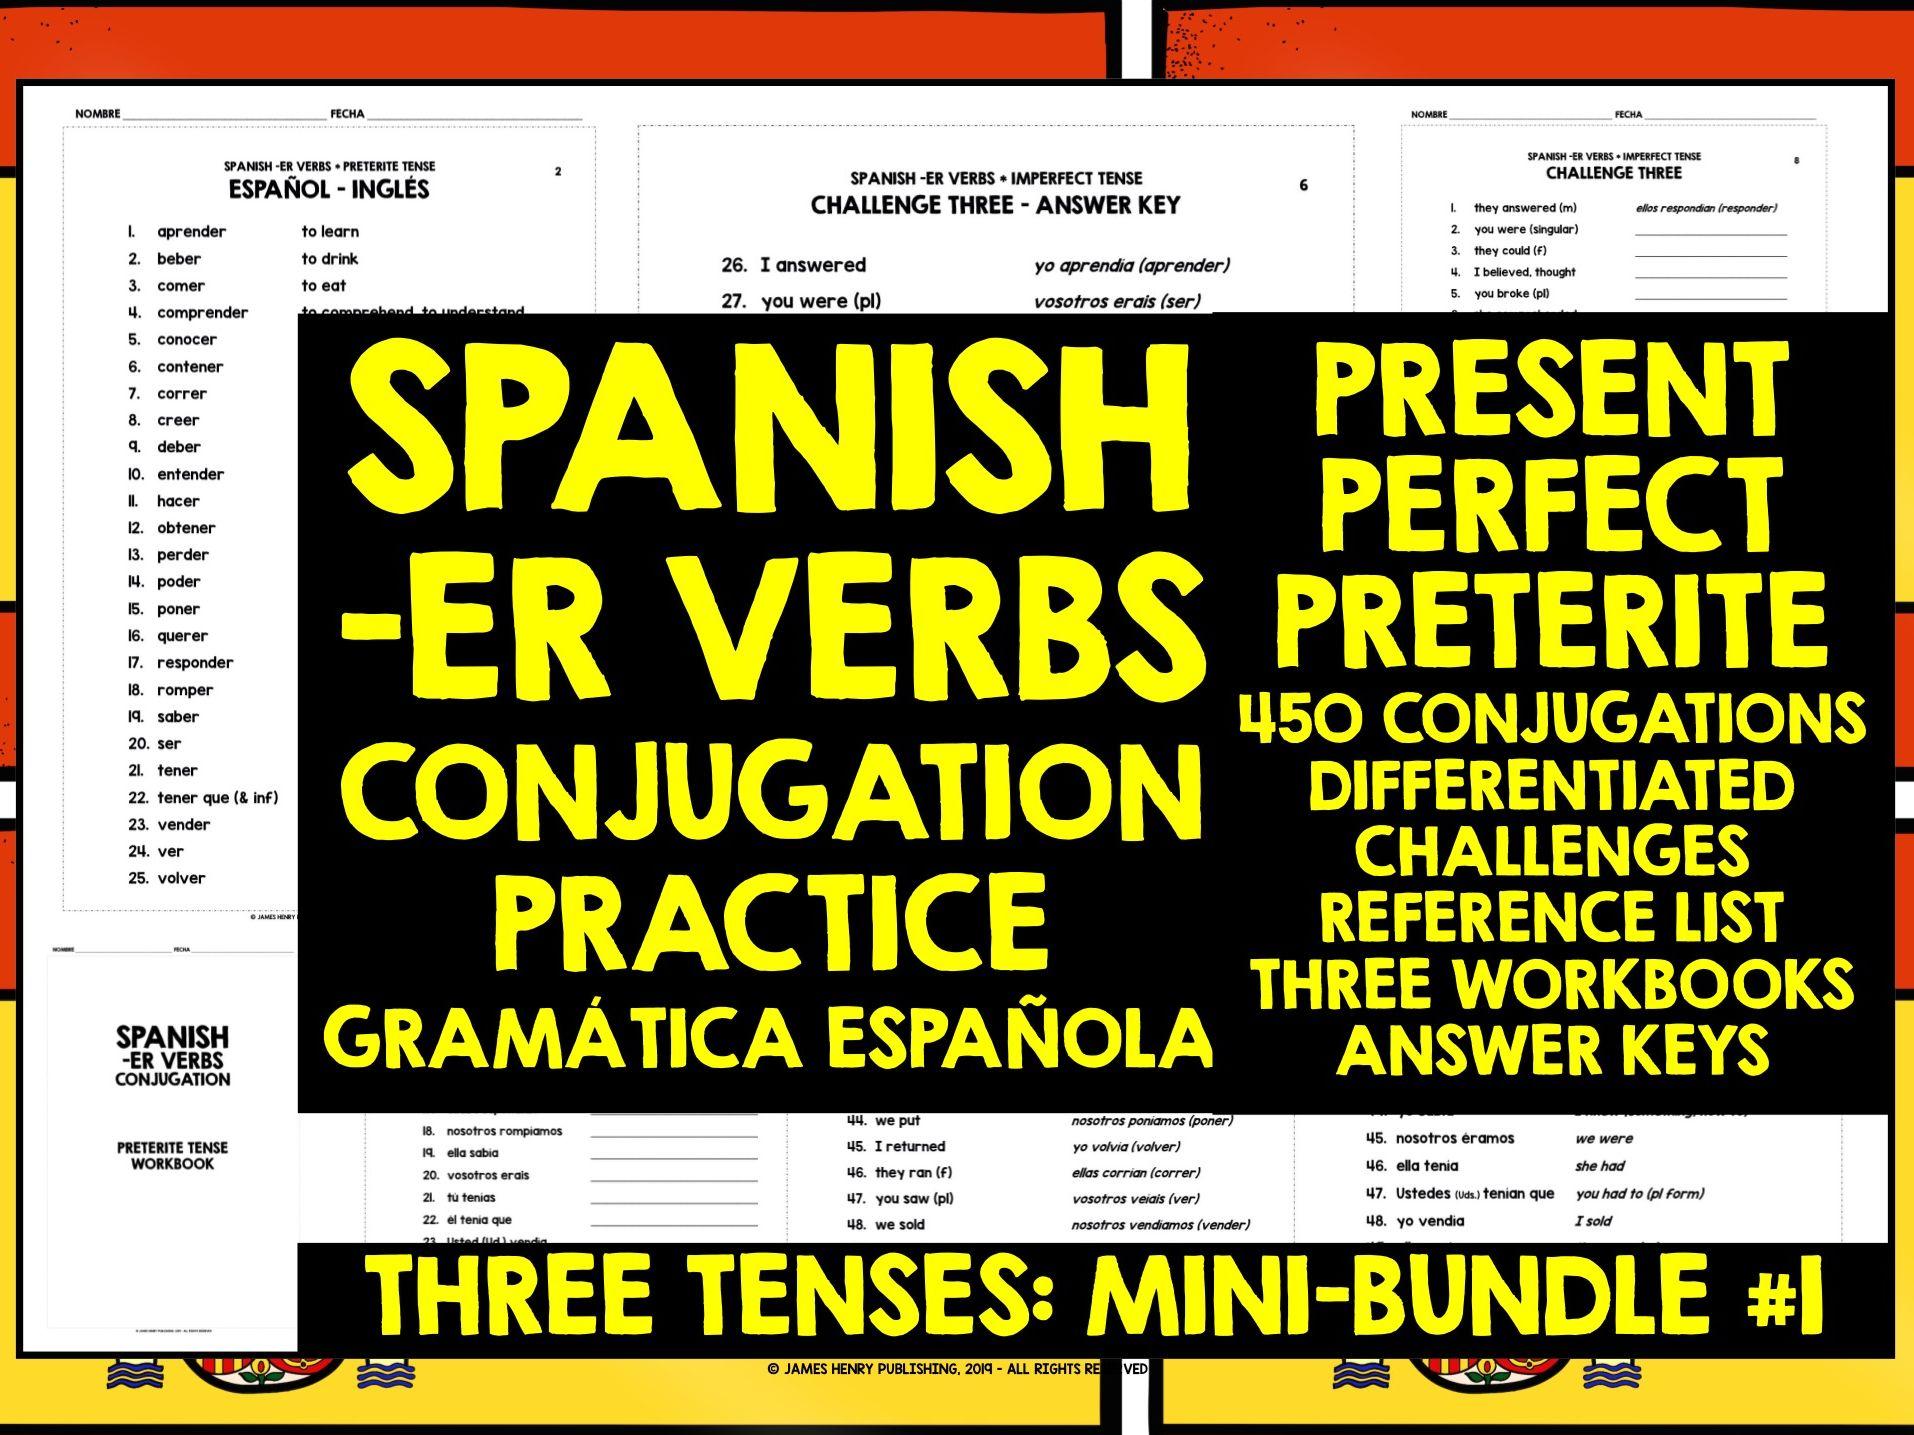 SPANISH ER VERBS GCSE CONJUGATION WORKBOOKS #1